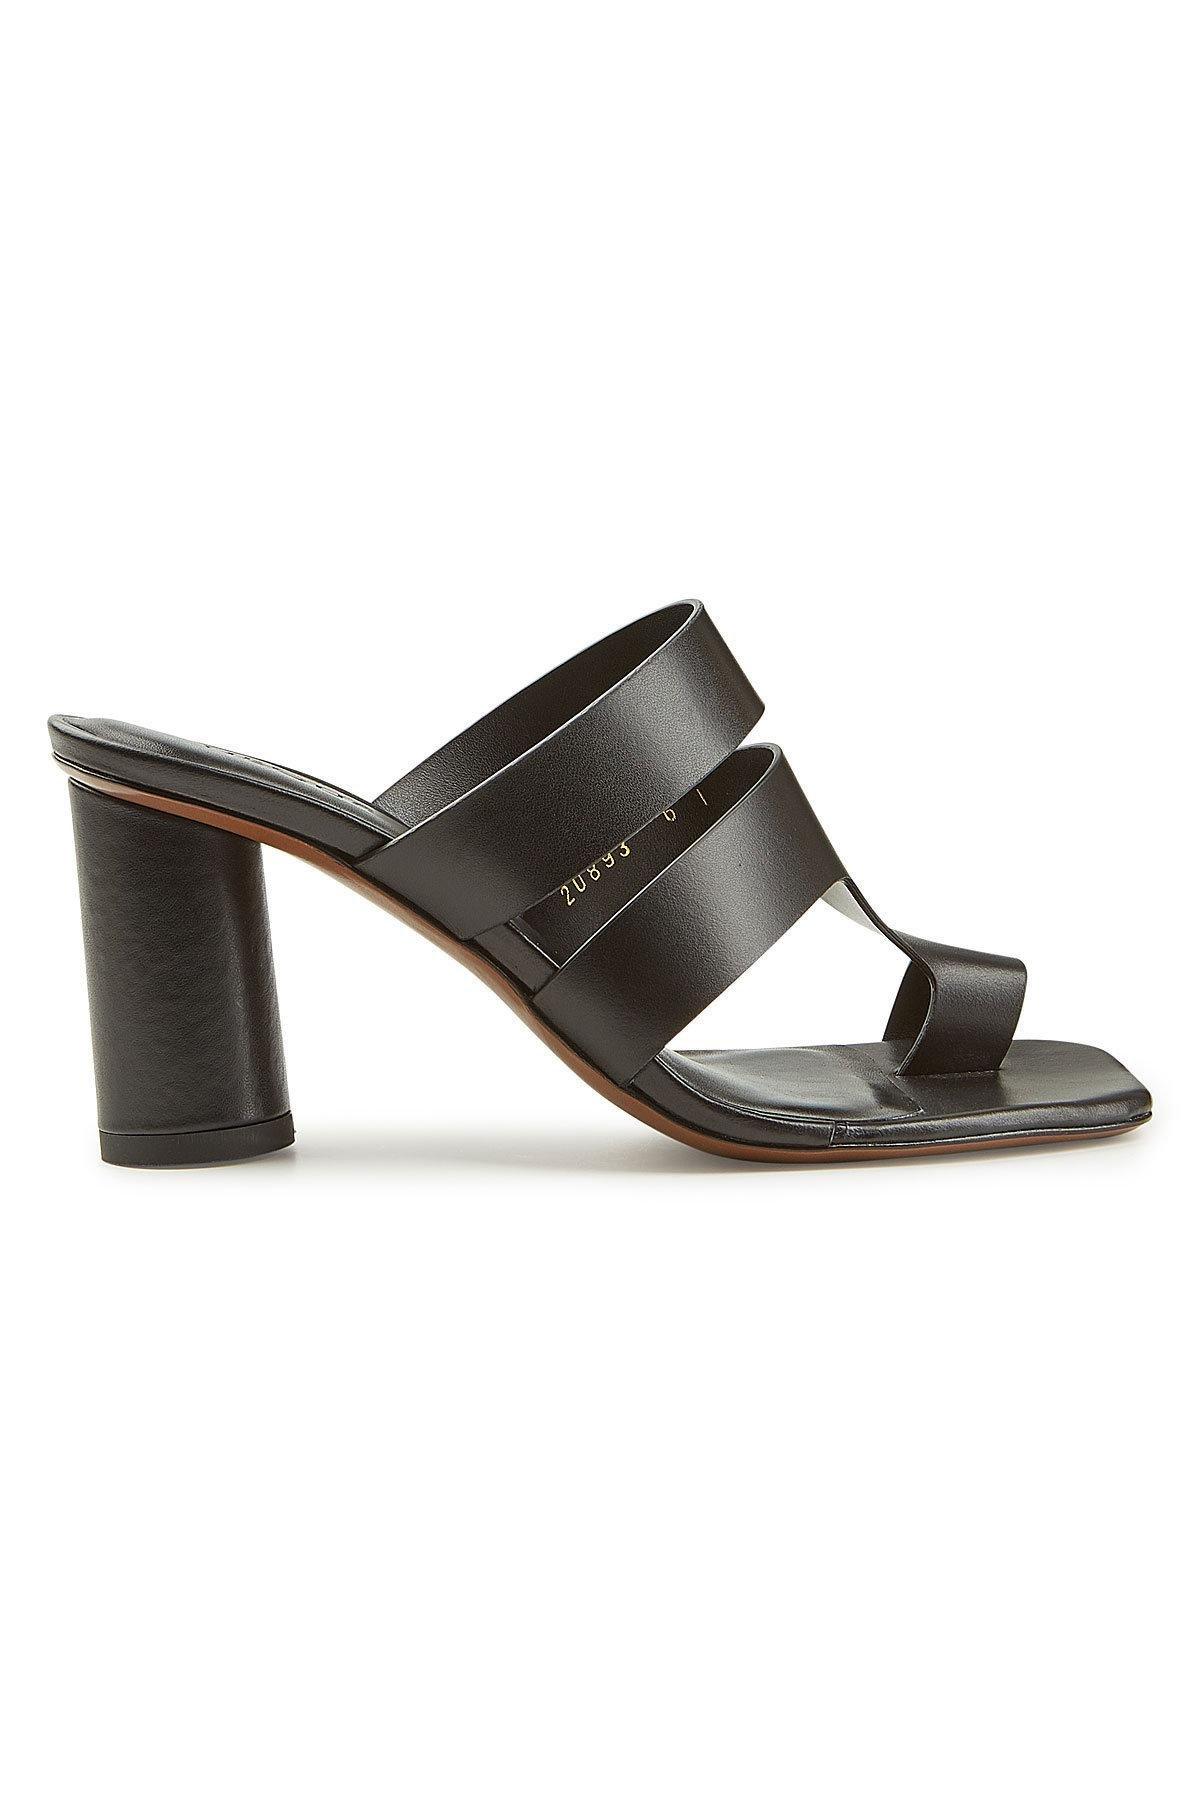 Neous Eury Leather Sandals Visit Online vfOJm